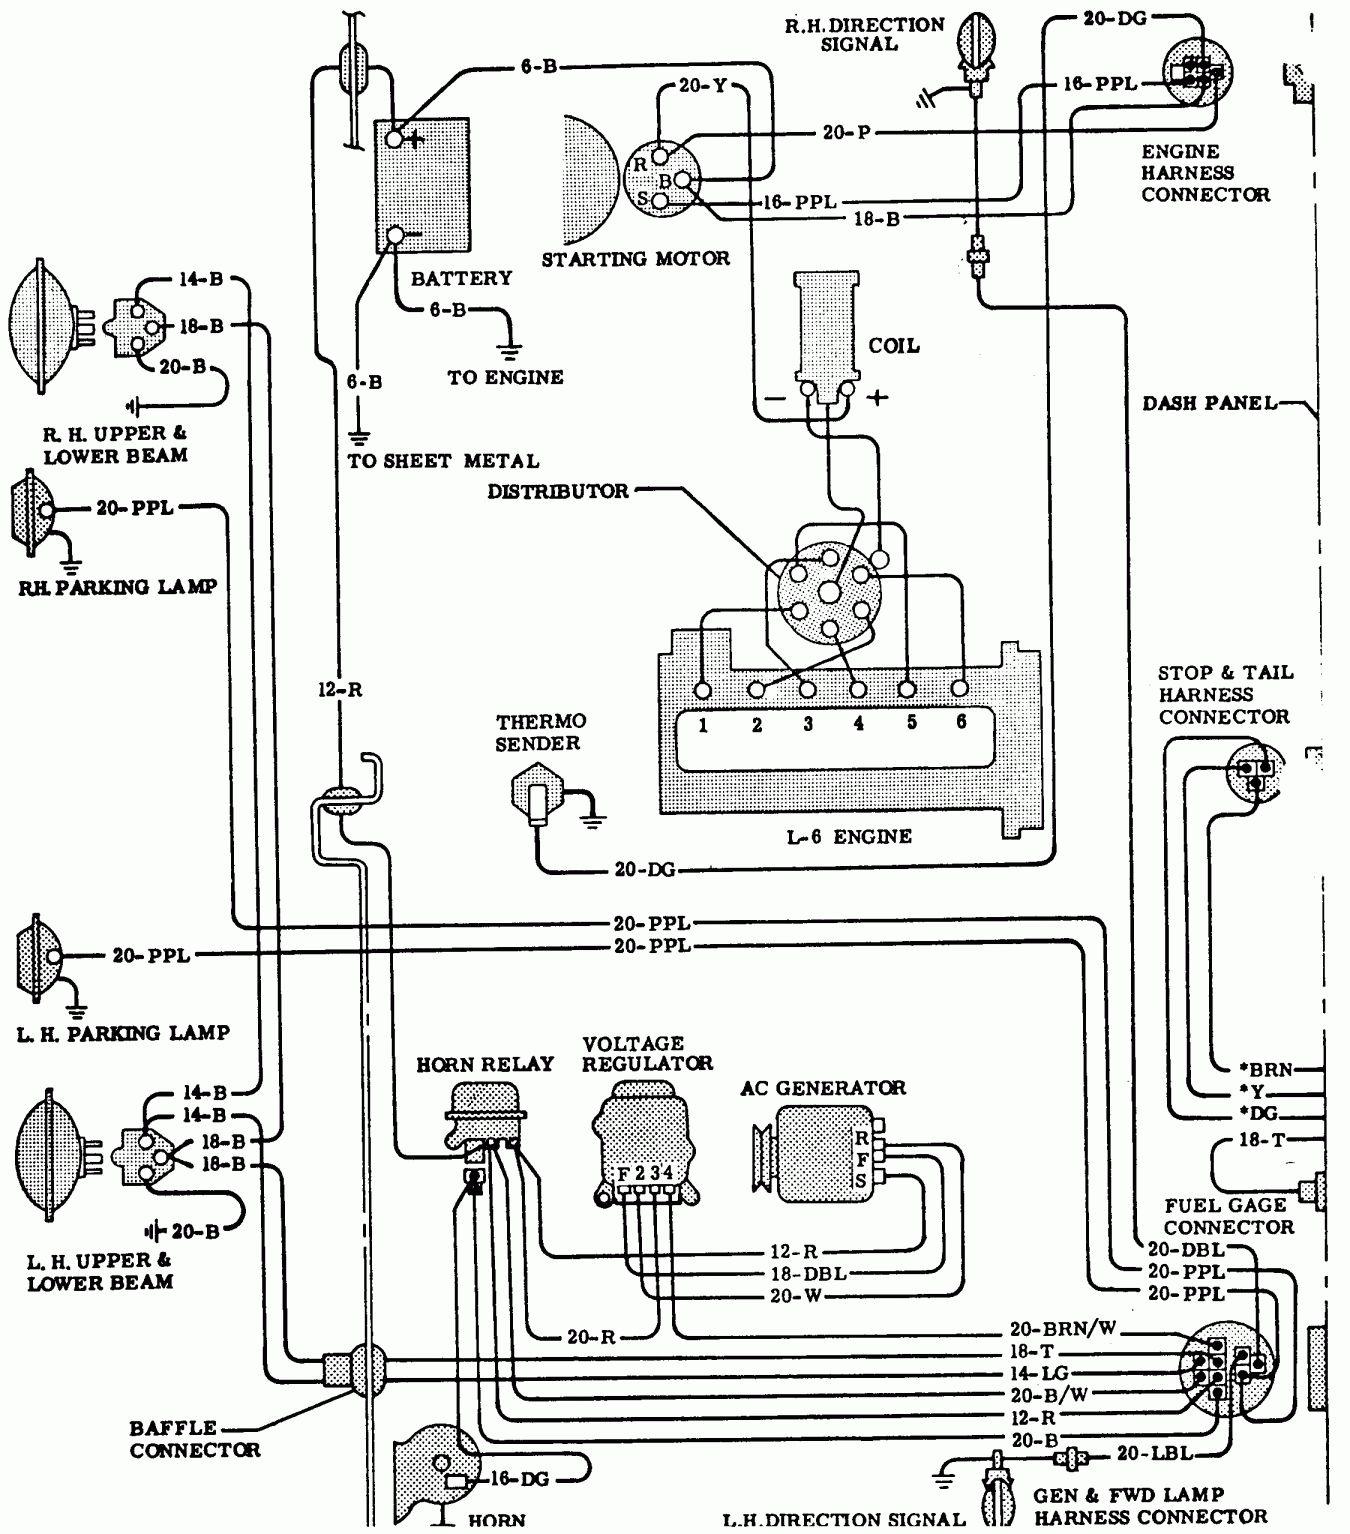 1966 impala fuse box 1966 c10 fuse box wiring diagram e6  1966 c10 fuse box wiring diagram e6